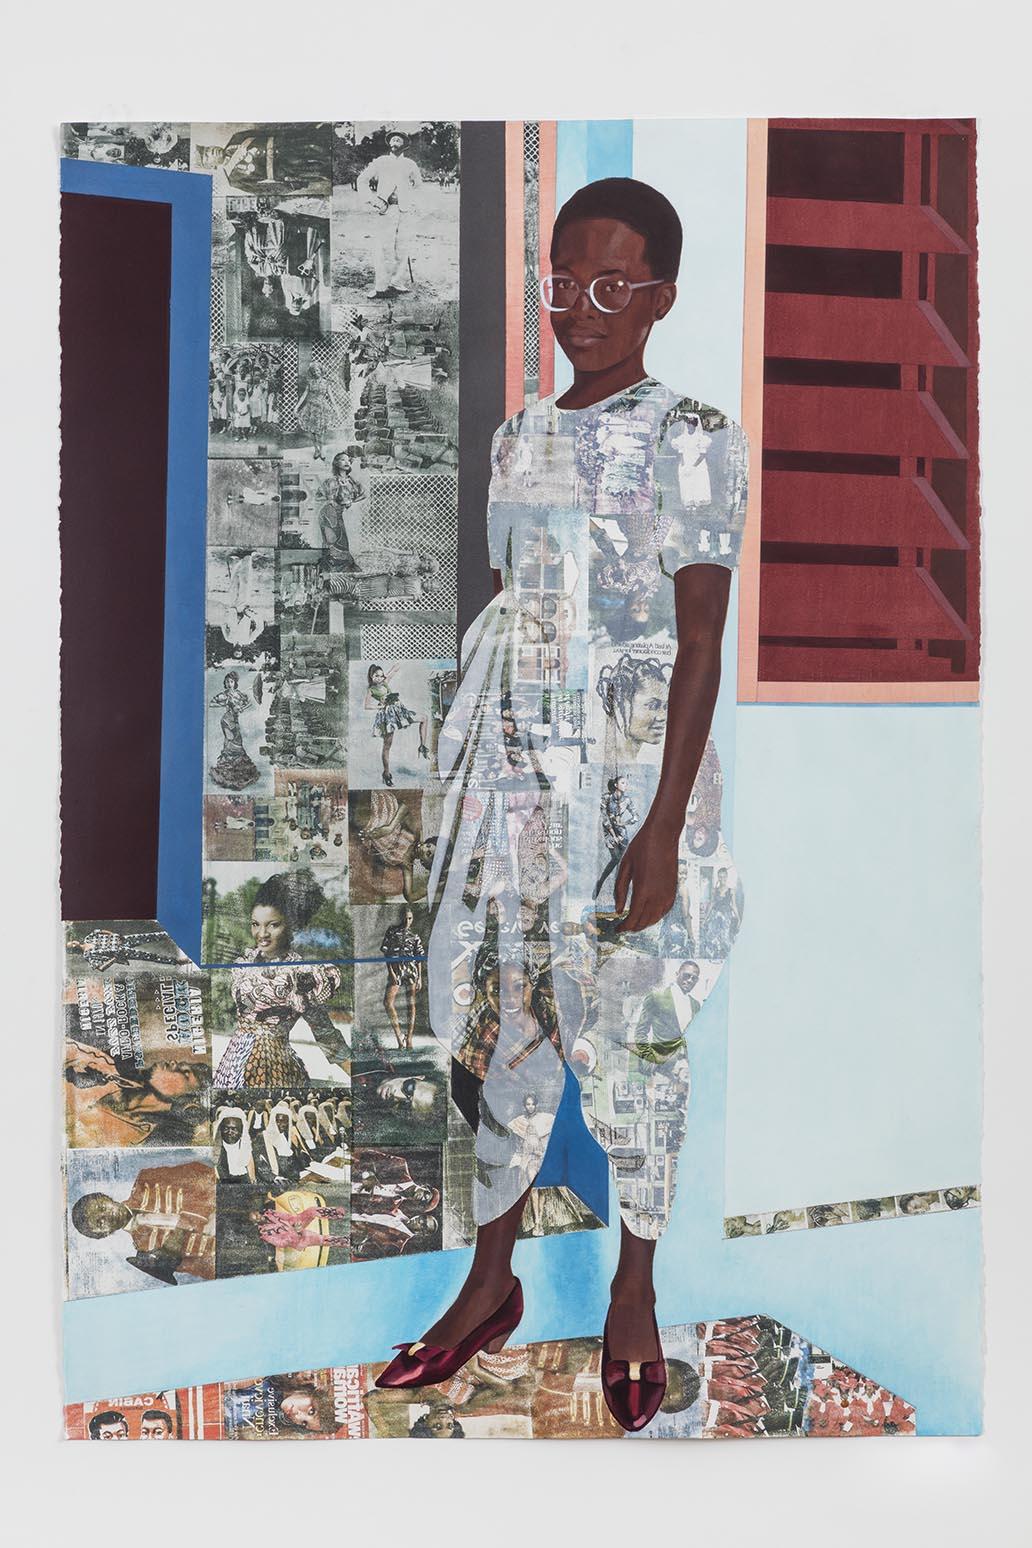 Njideka Akunyili Crosby, The Beautyful Ones no.1, 2015. 亚克力、粉彩、彩色铅笔和施乐纸上转印。 60 x 42 英寸。由艺术家和伦敦维多利亚米罗提供。杰森·威奇摄。